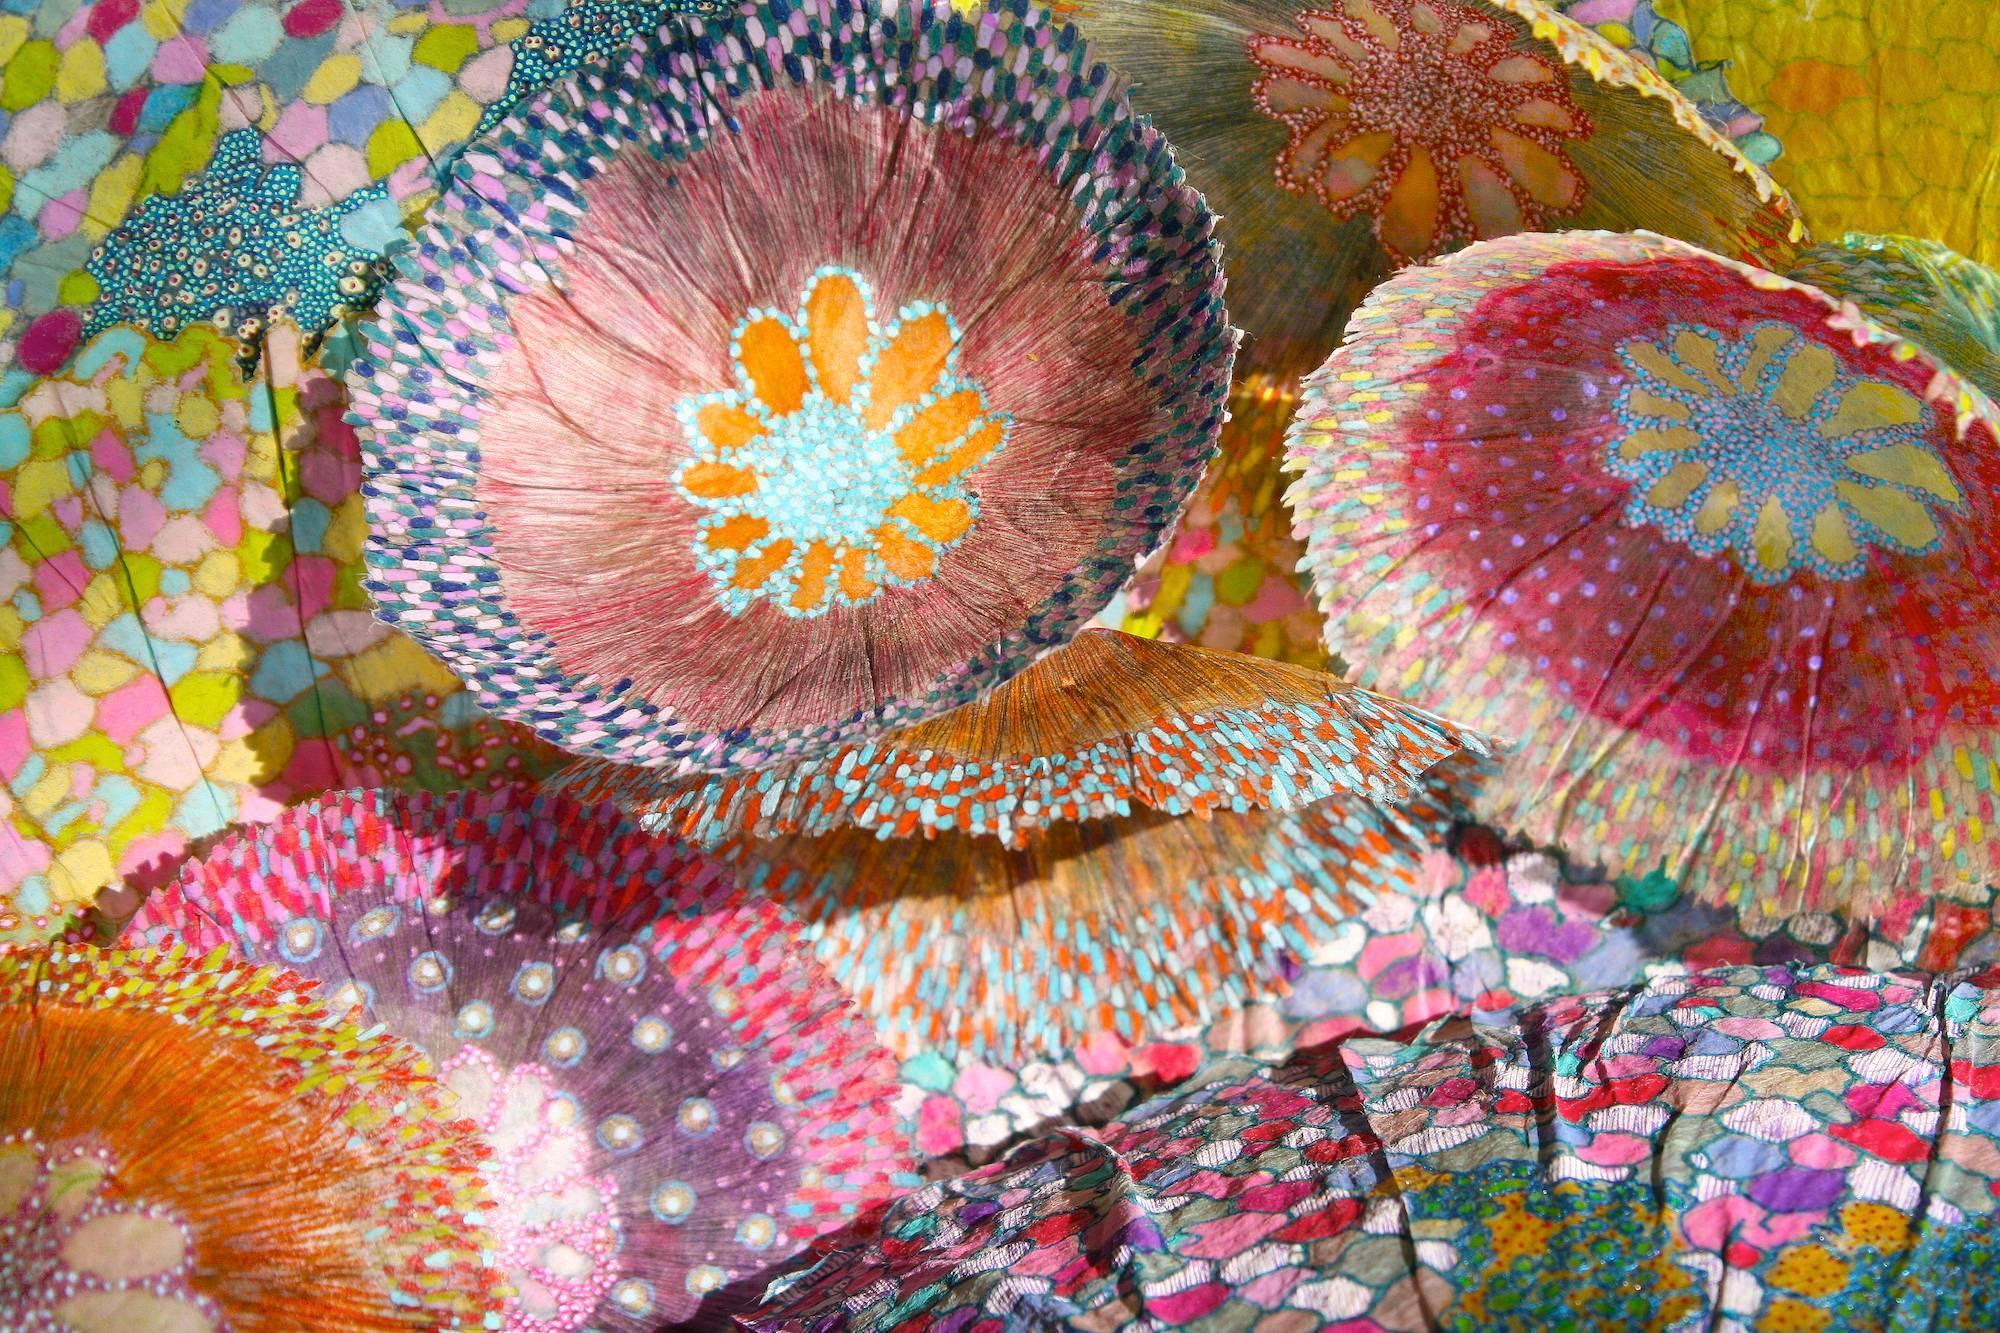 Cascade II, Bright Botanical Print on Aluminum, Pink, Blue, Green Floral Shapes